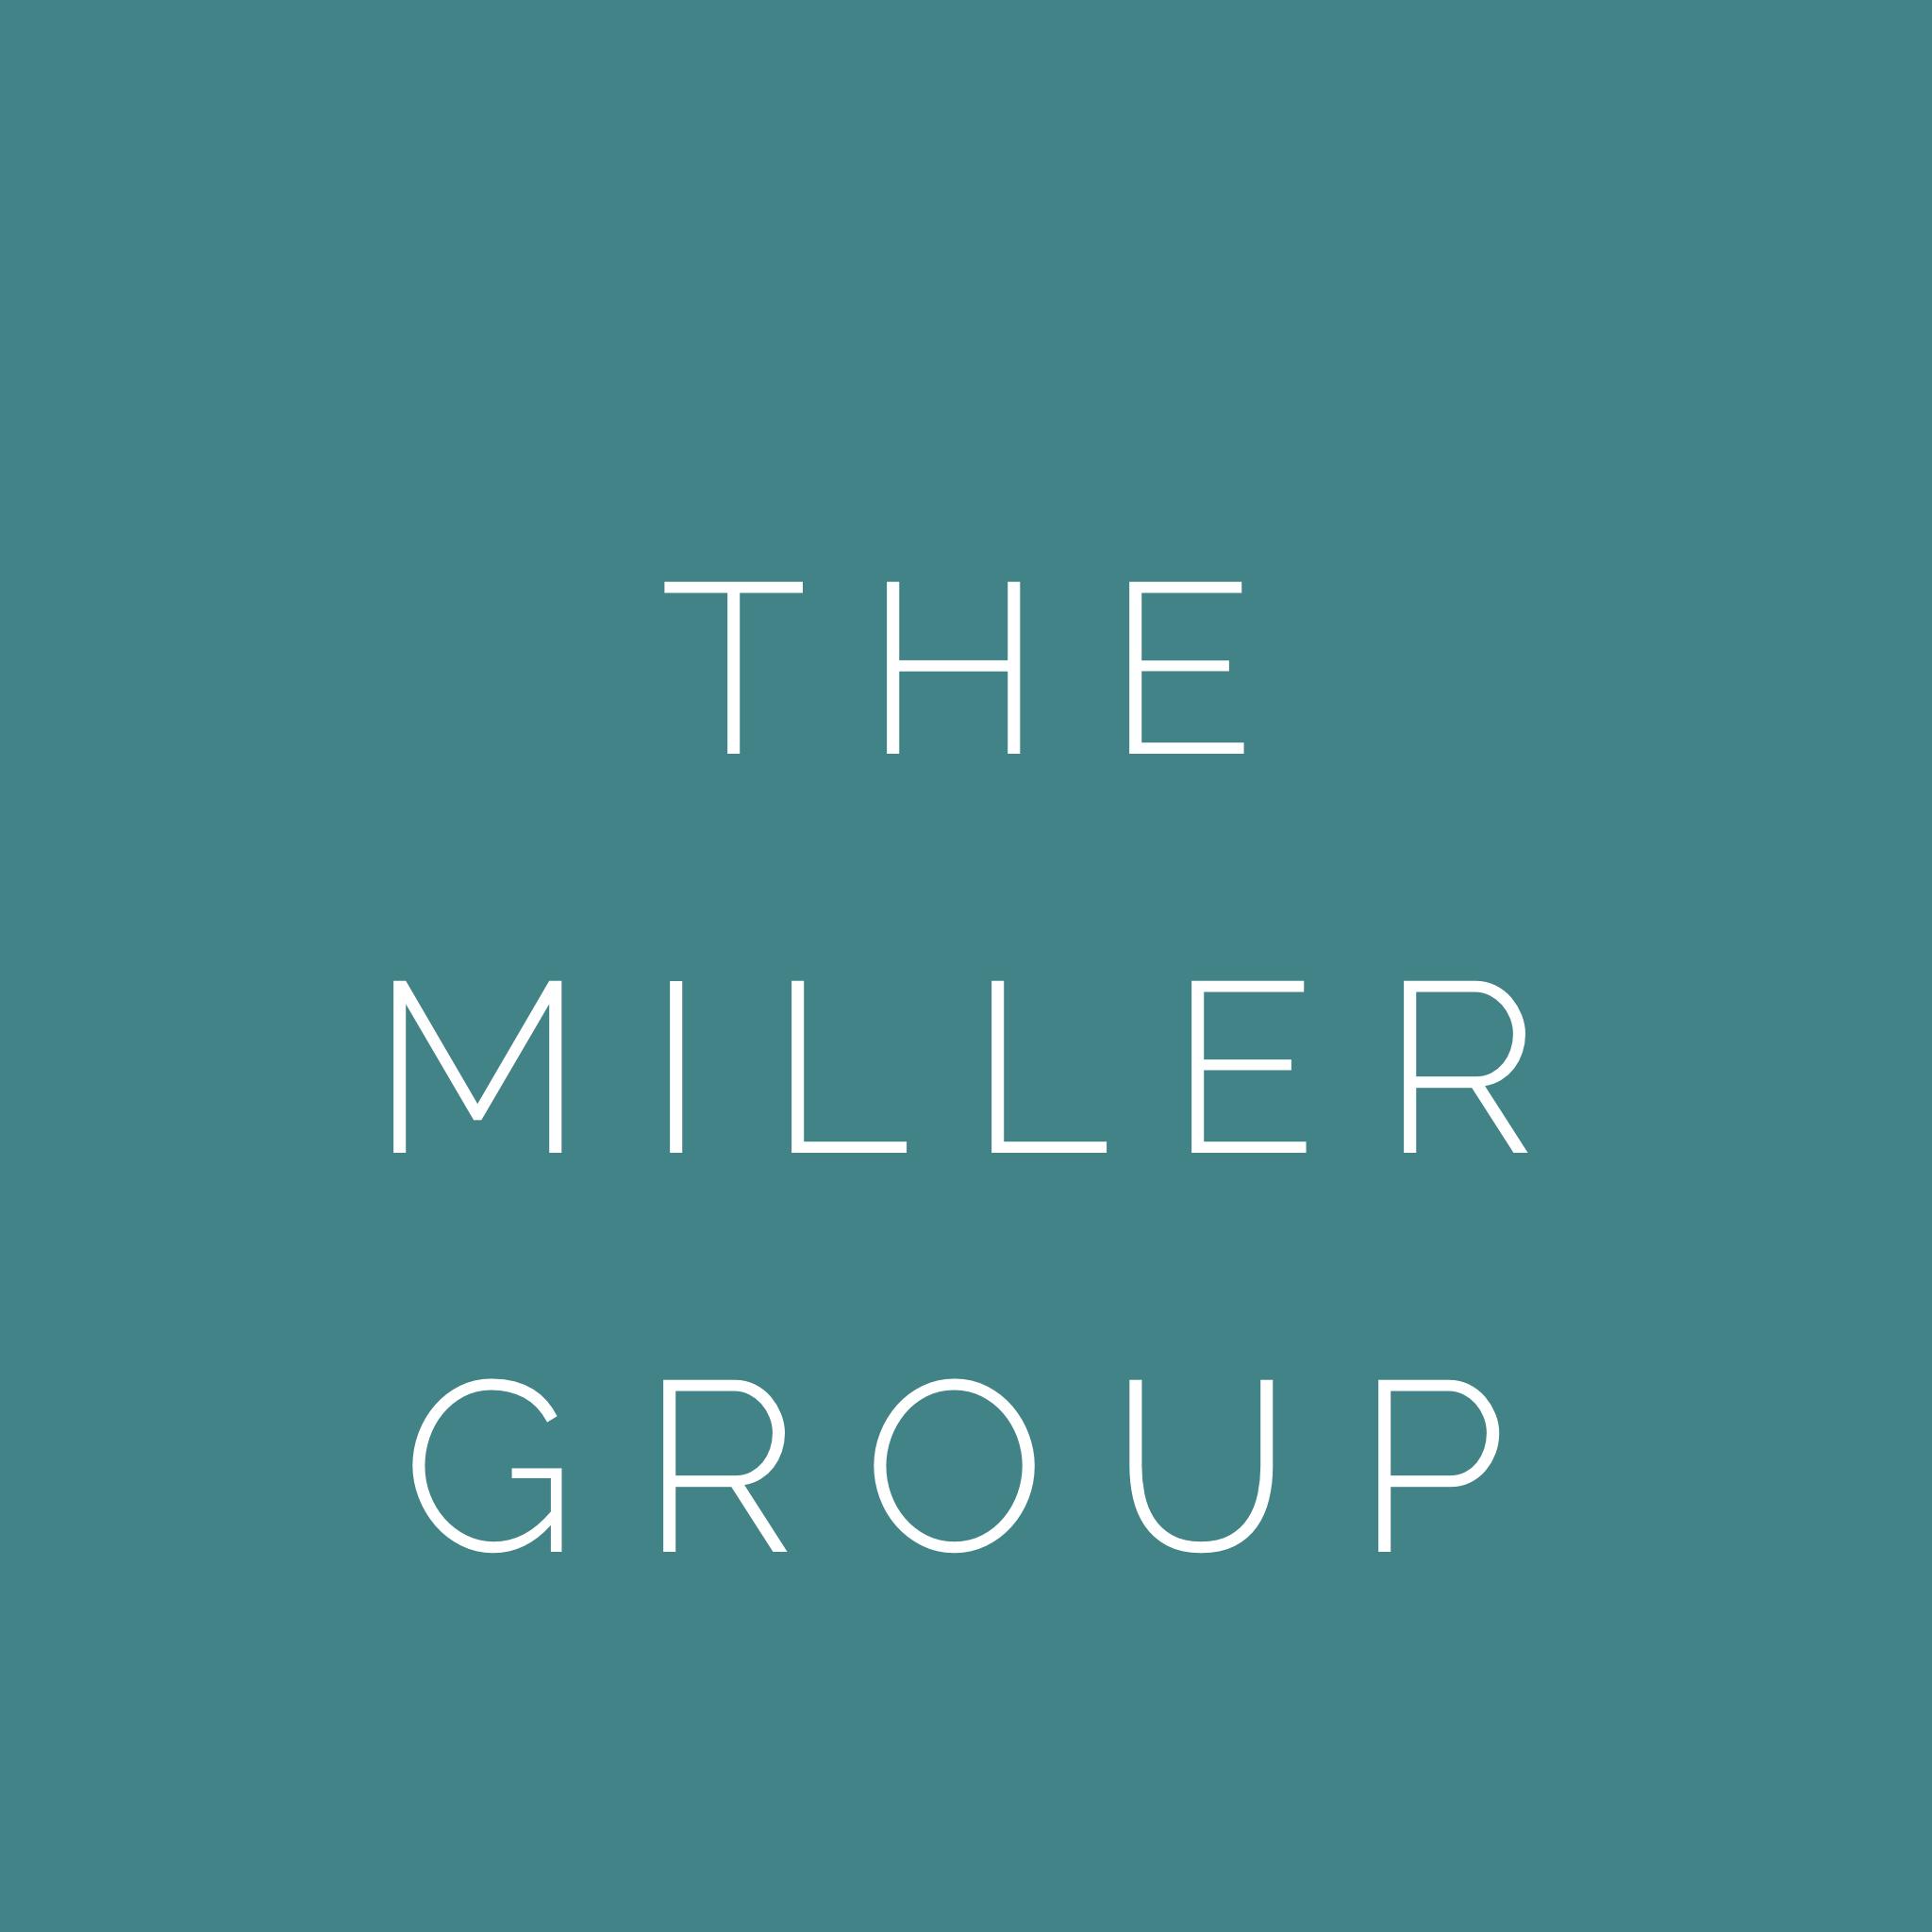 The Miller Group at Keller Williams logo